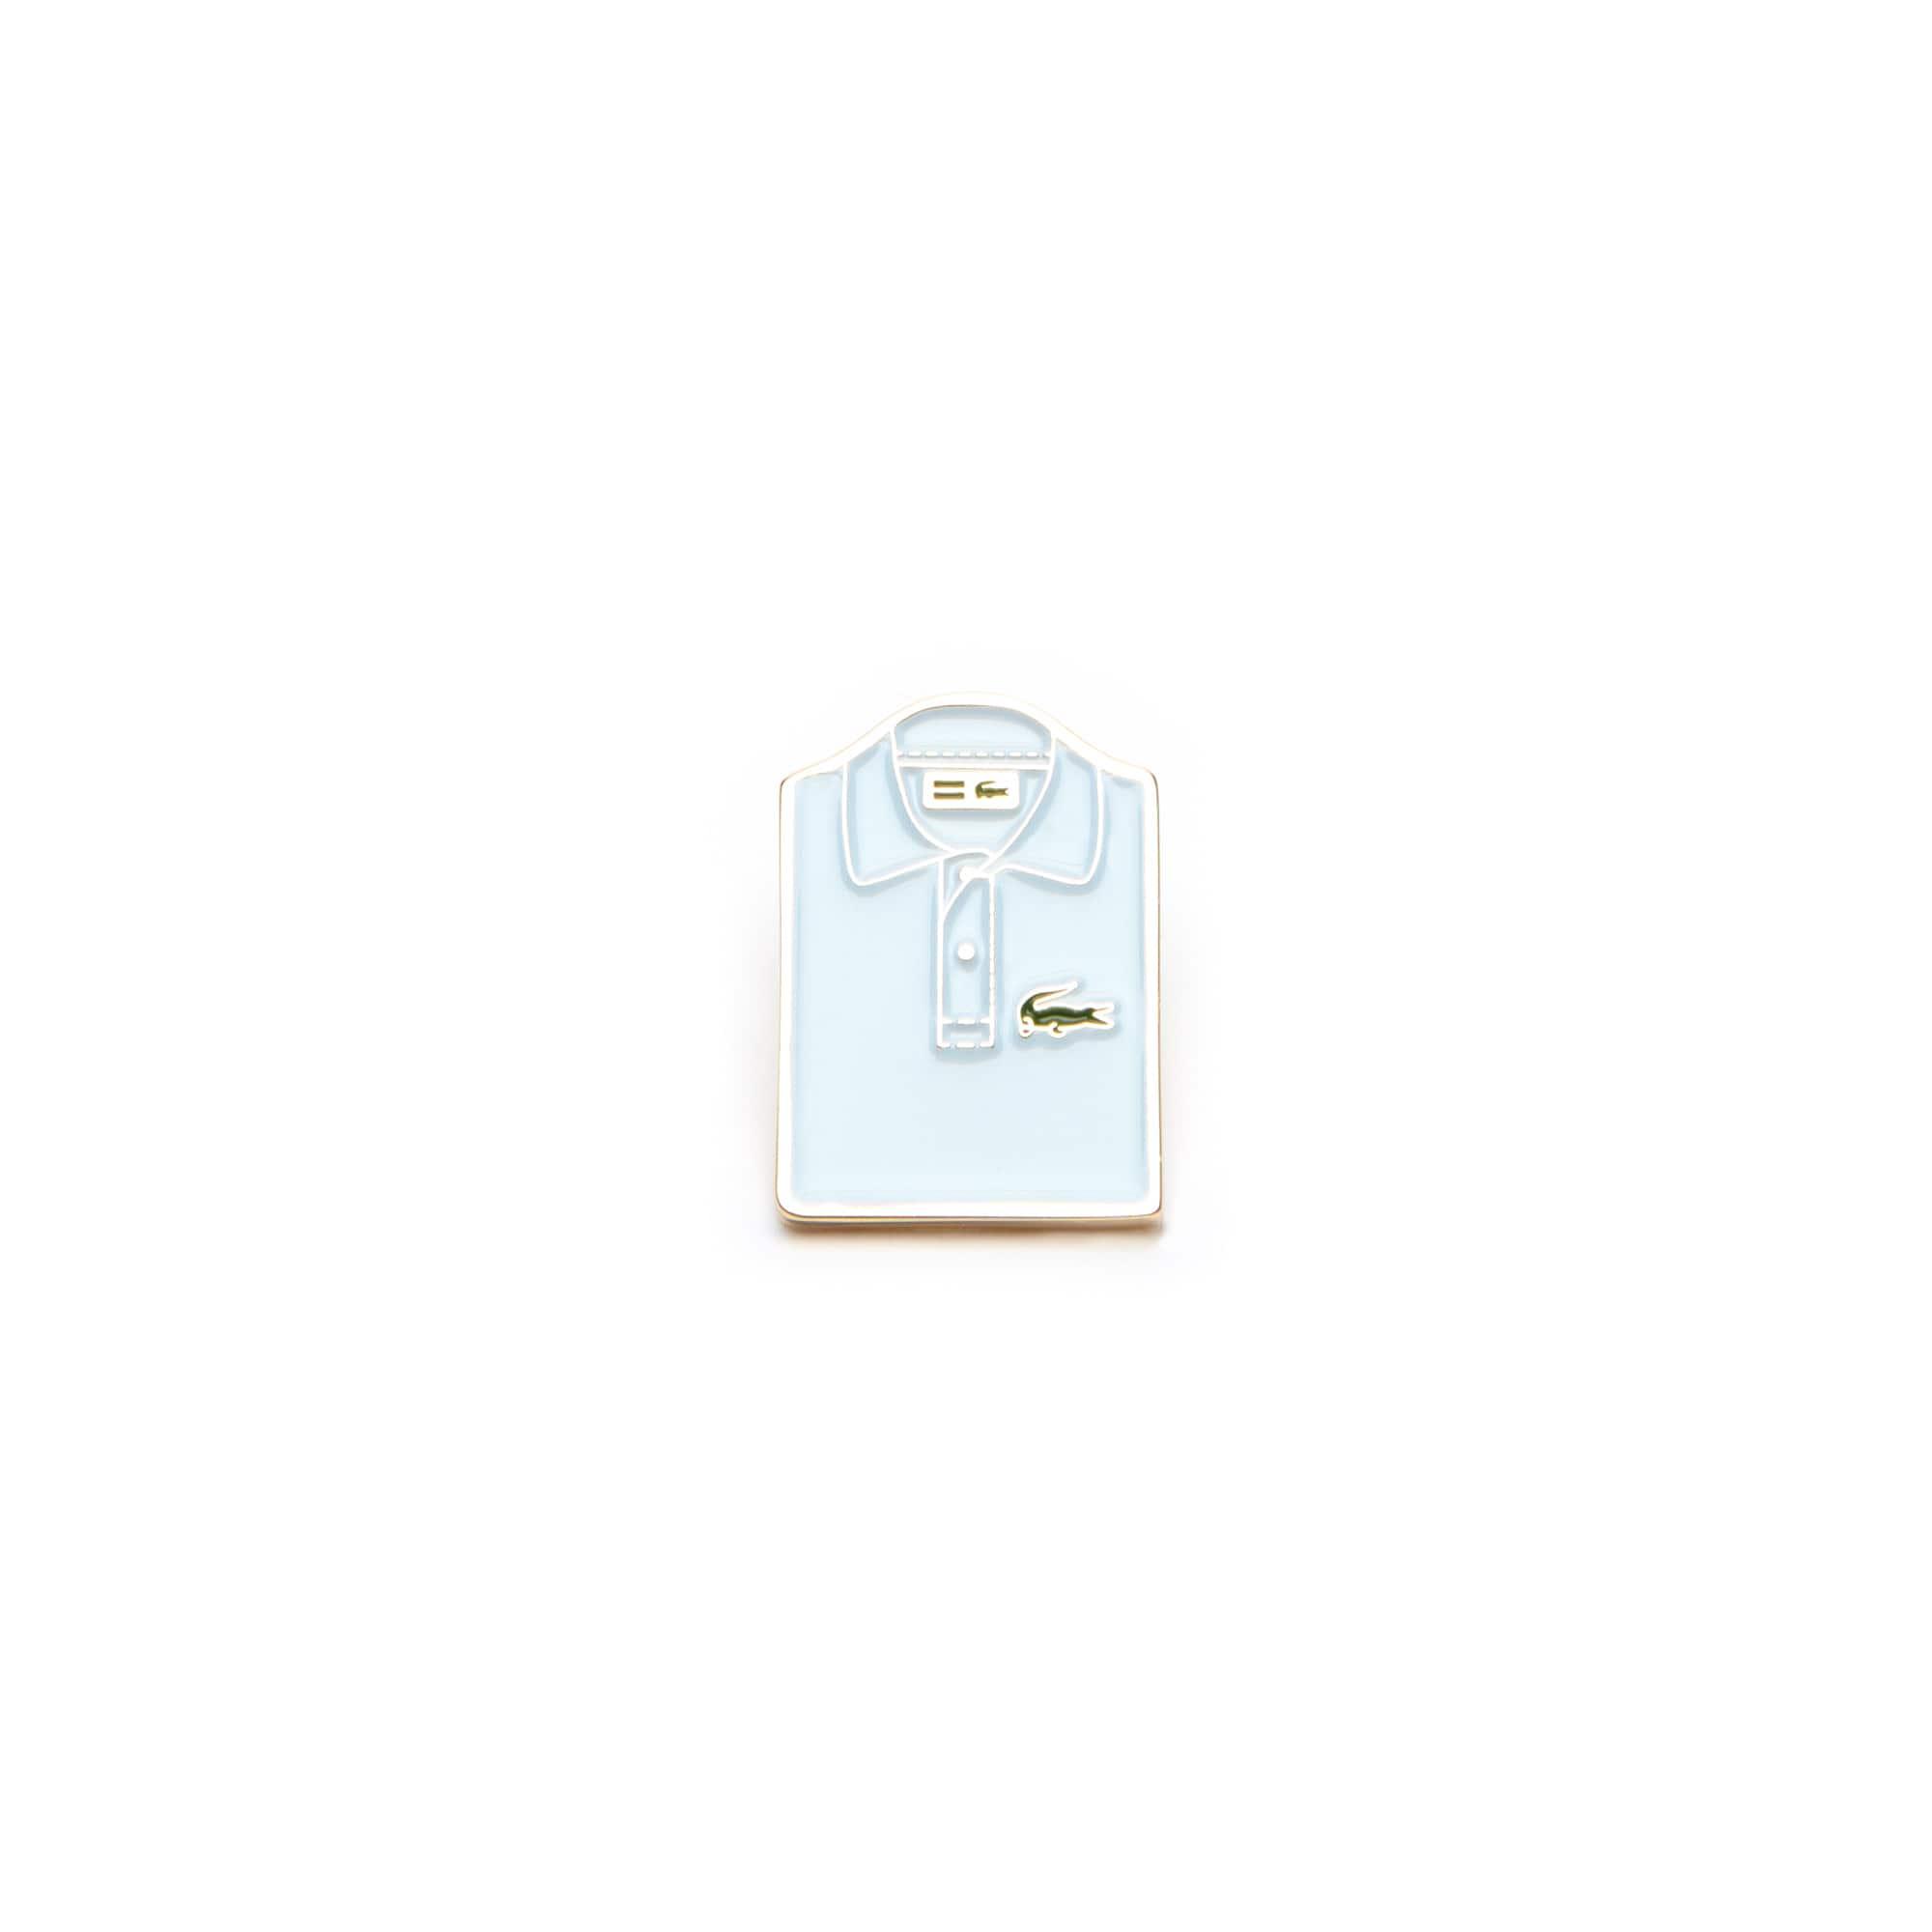 Lacoste Polo Fashion Show Pin Badge